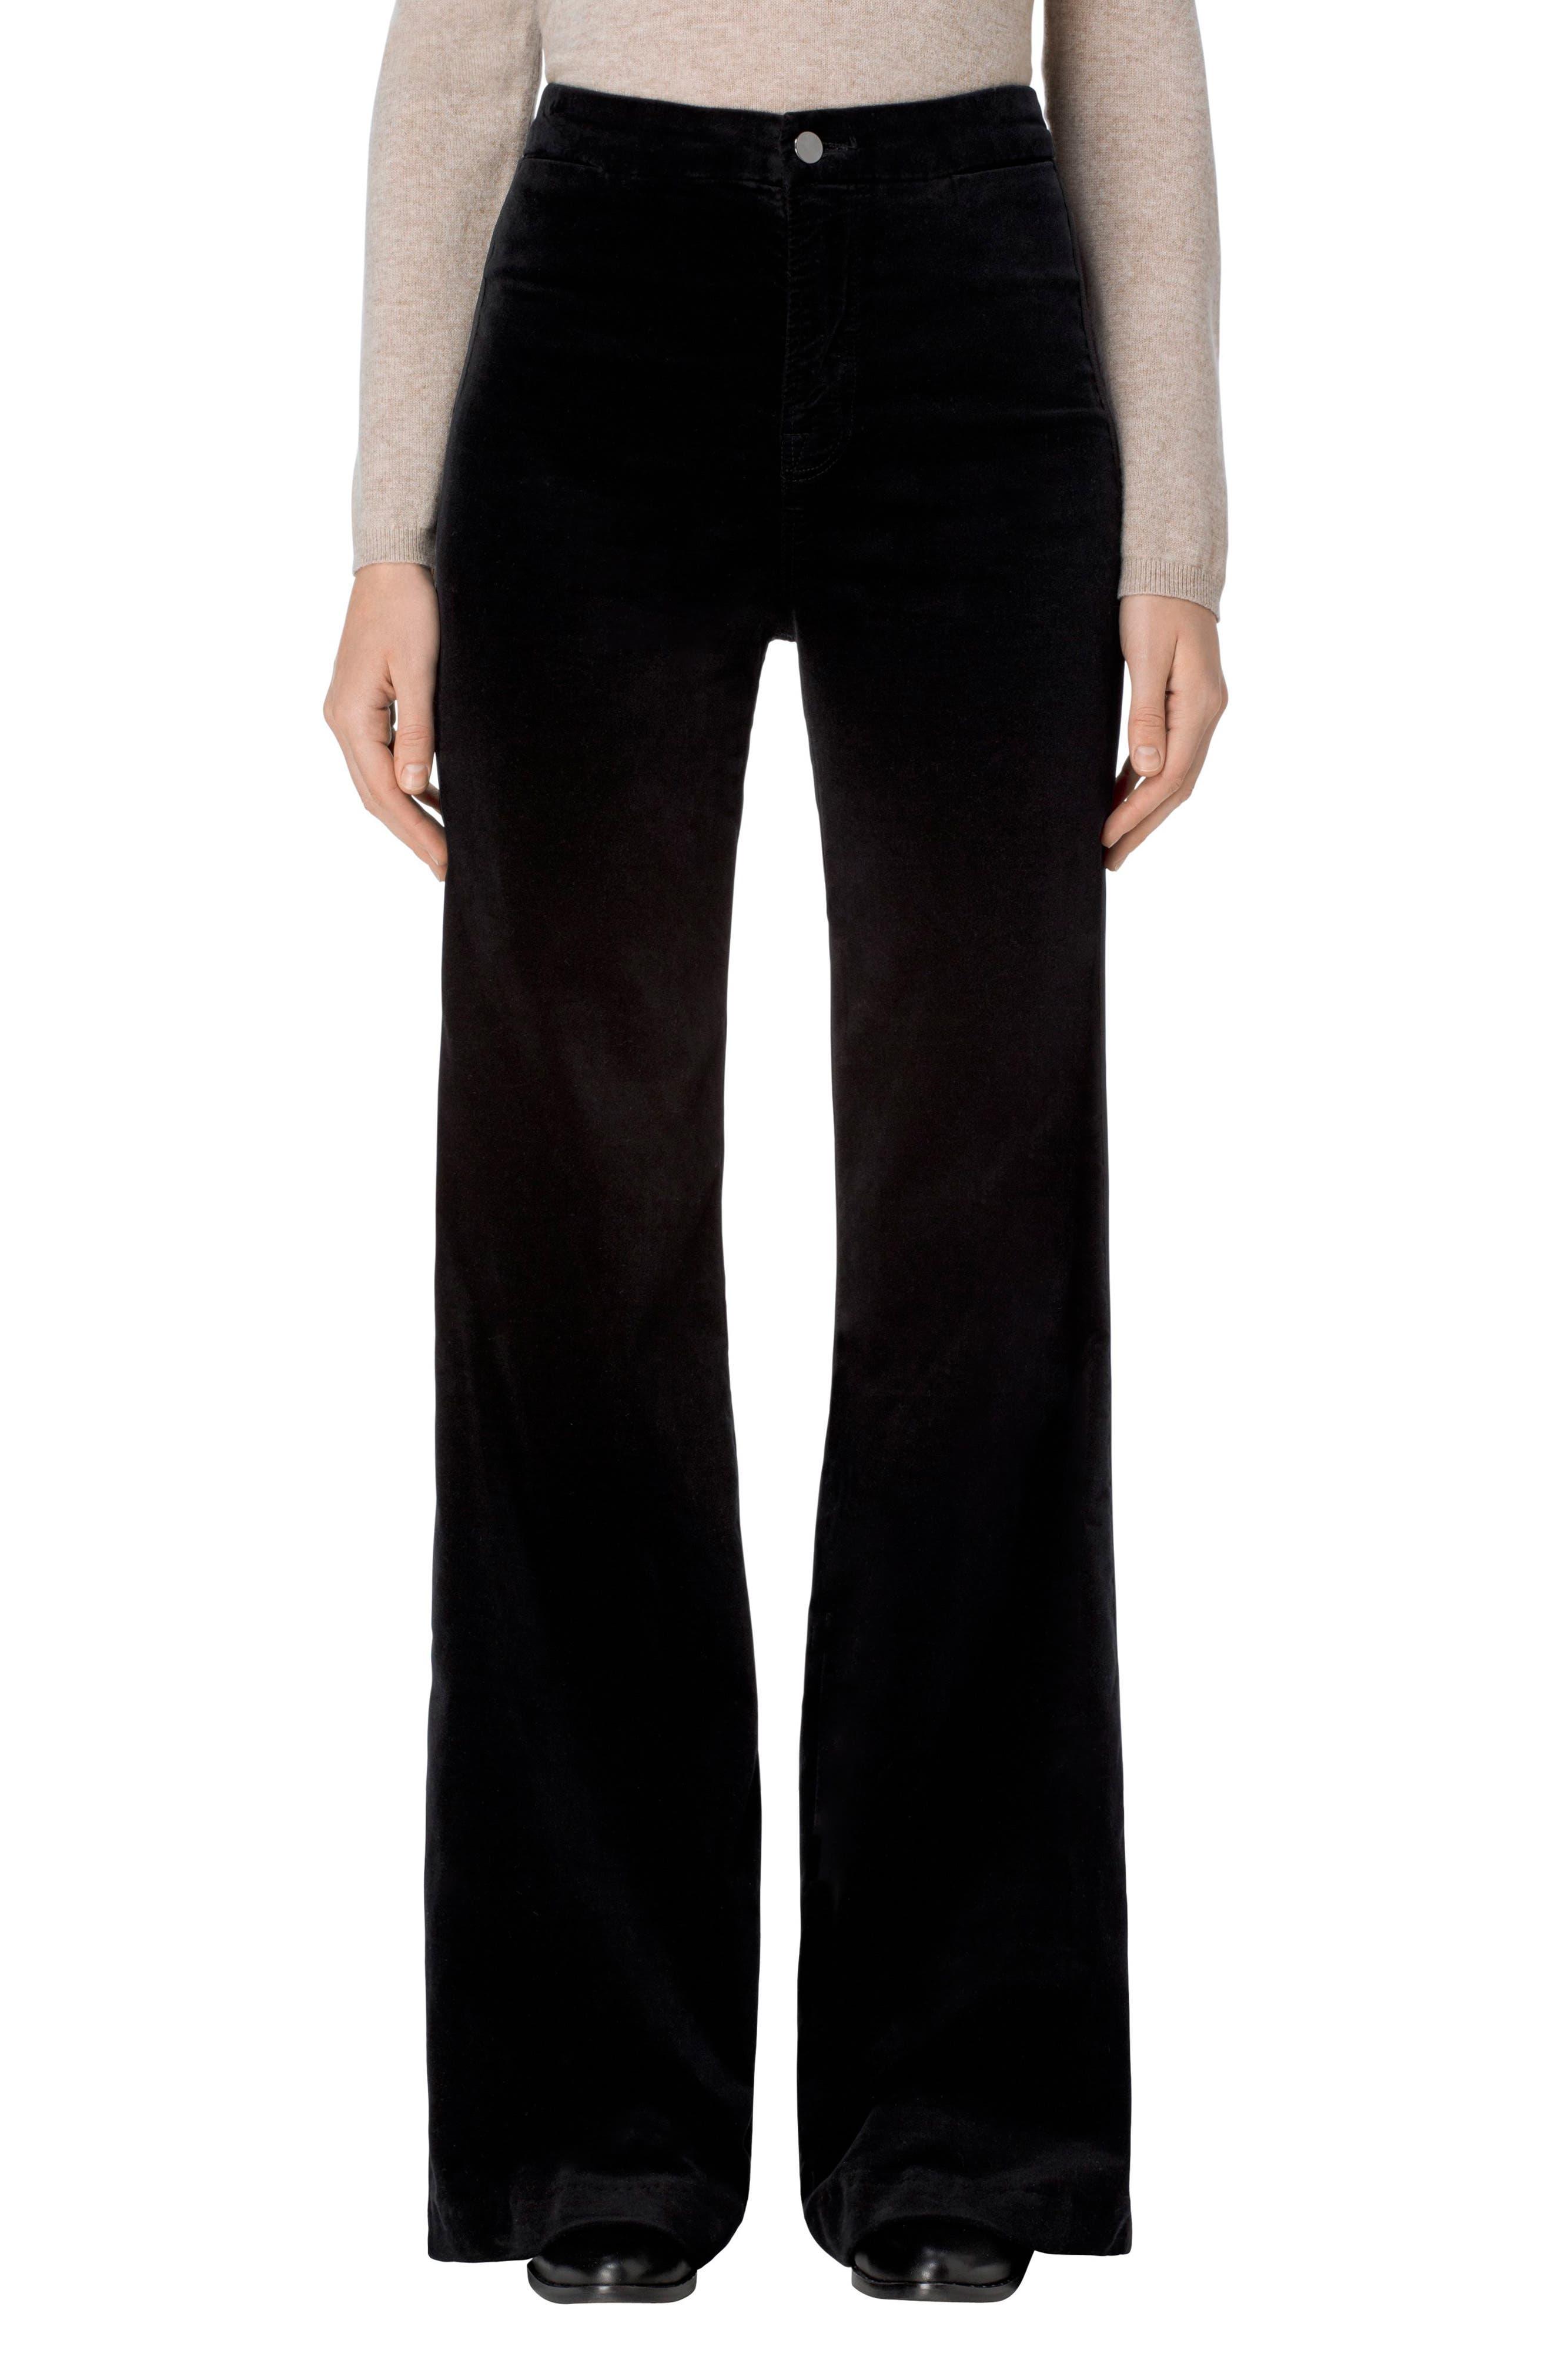 Alternate Image 1 Selected - J Brand Isabella High Rise Flare Leg Pants